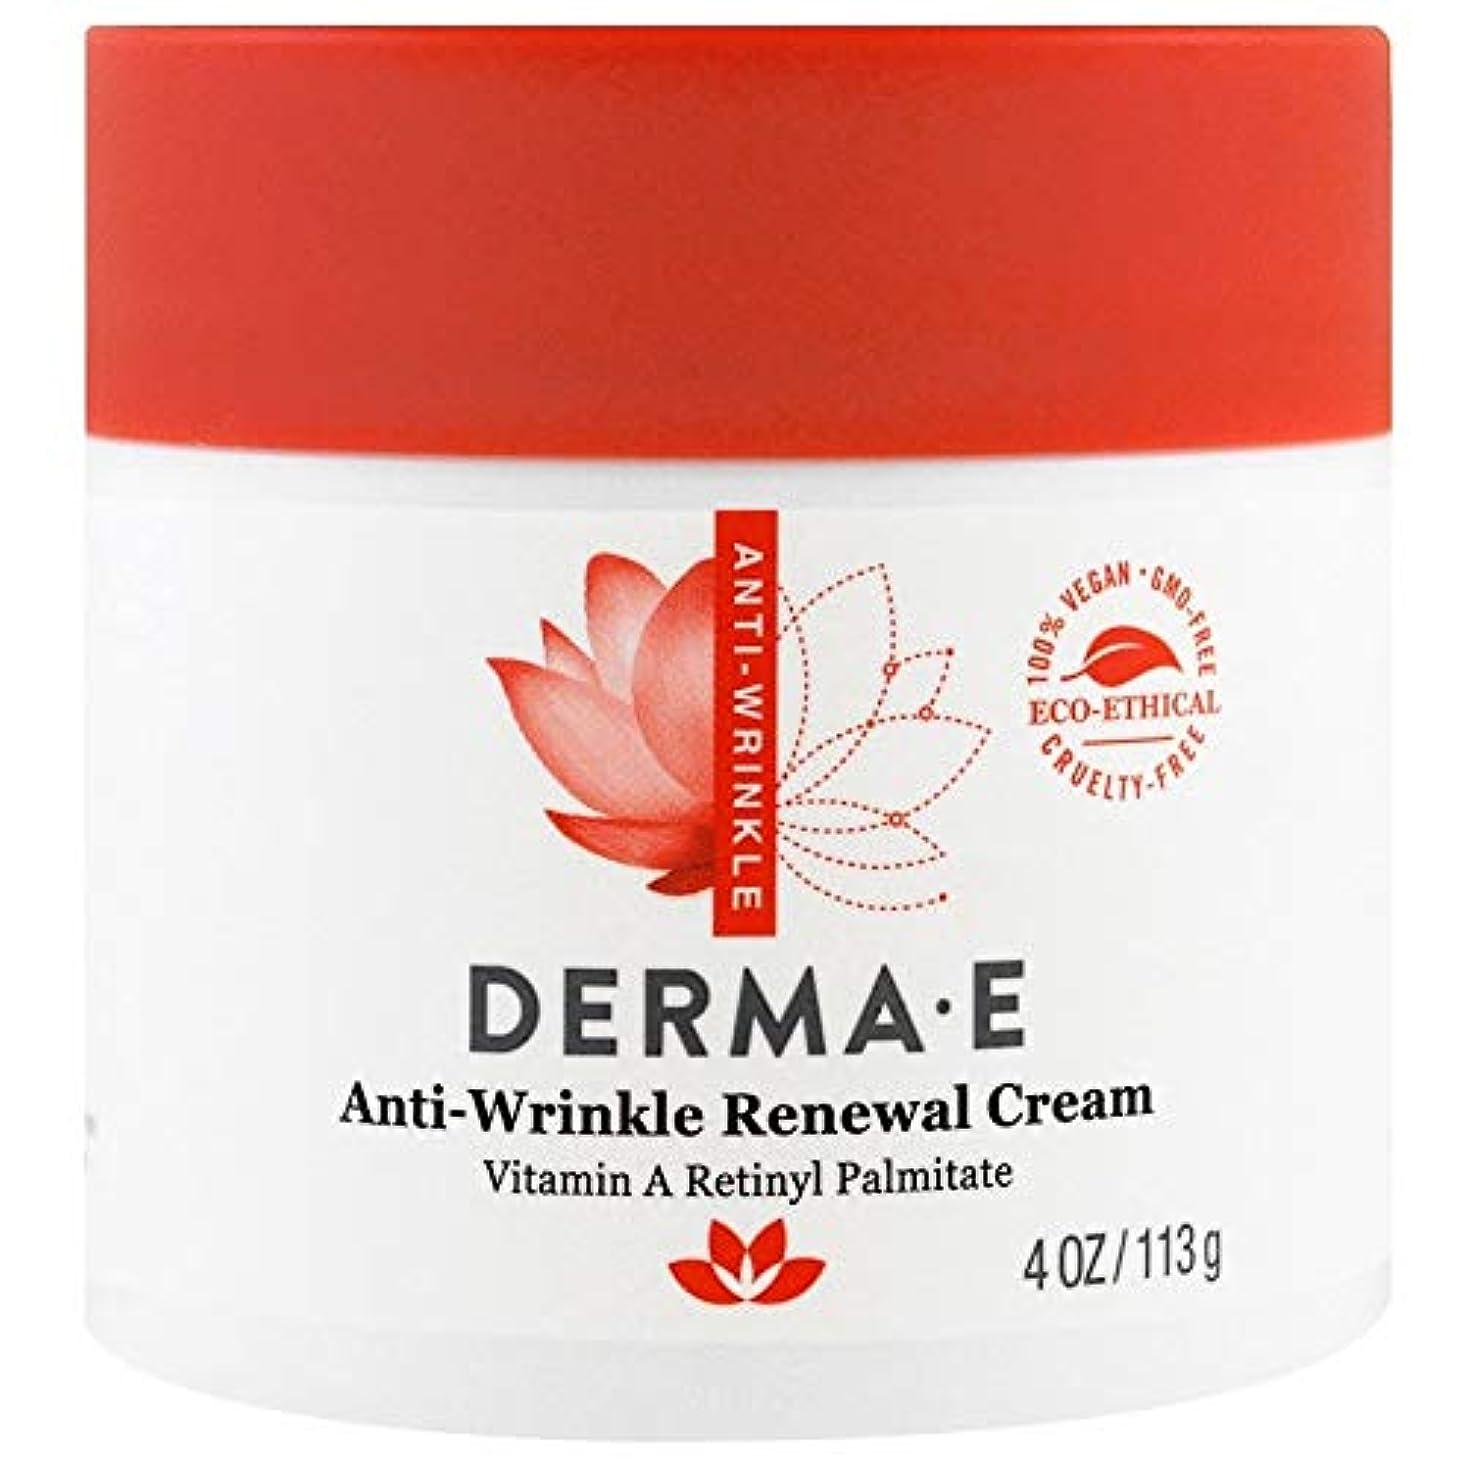 一次選挙ビールDerma E, Anti-Wrinkle Vitamin A Retinyl Palmitate Cream, 4 oz (113 g)X 2 パック並行輸入品